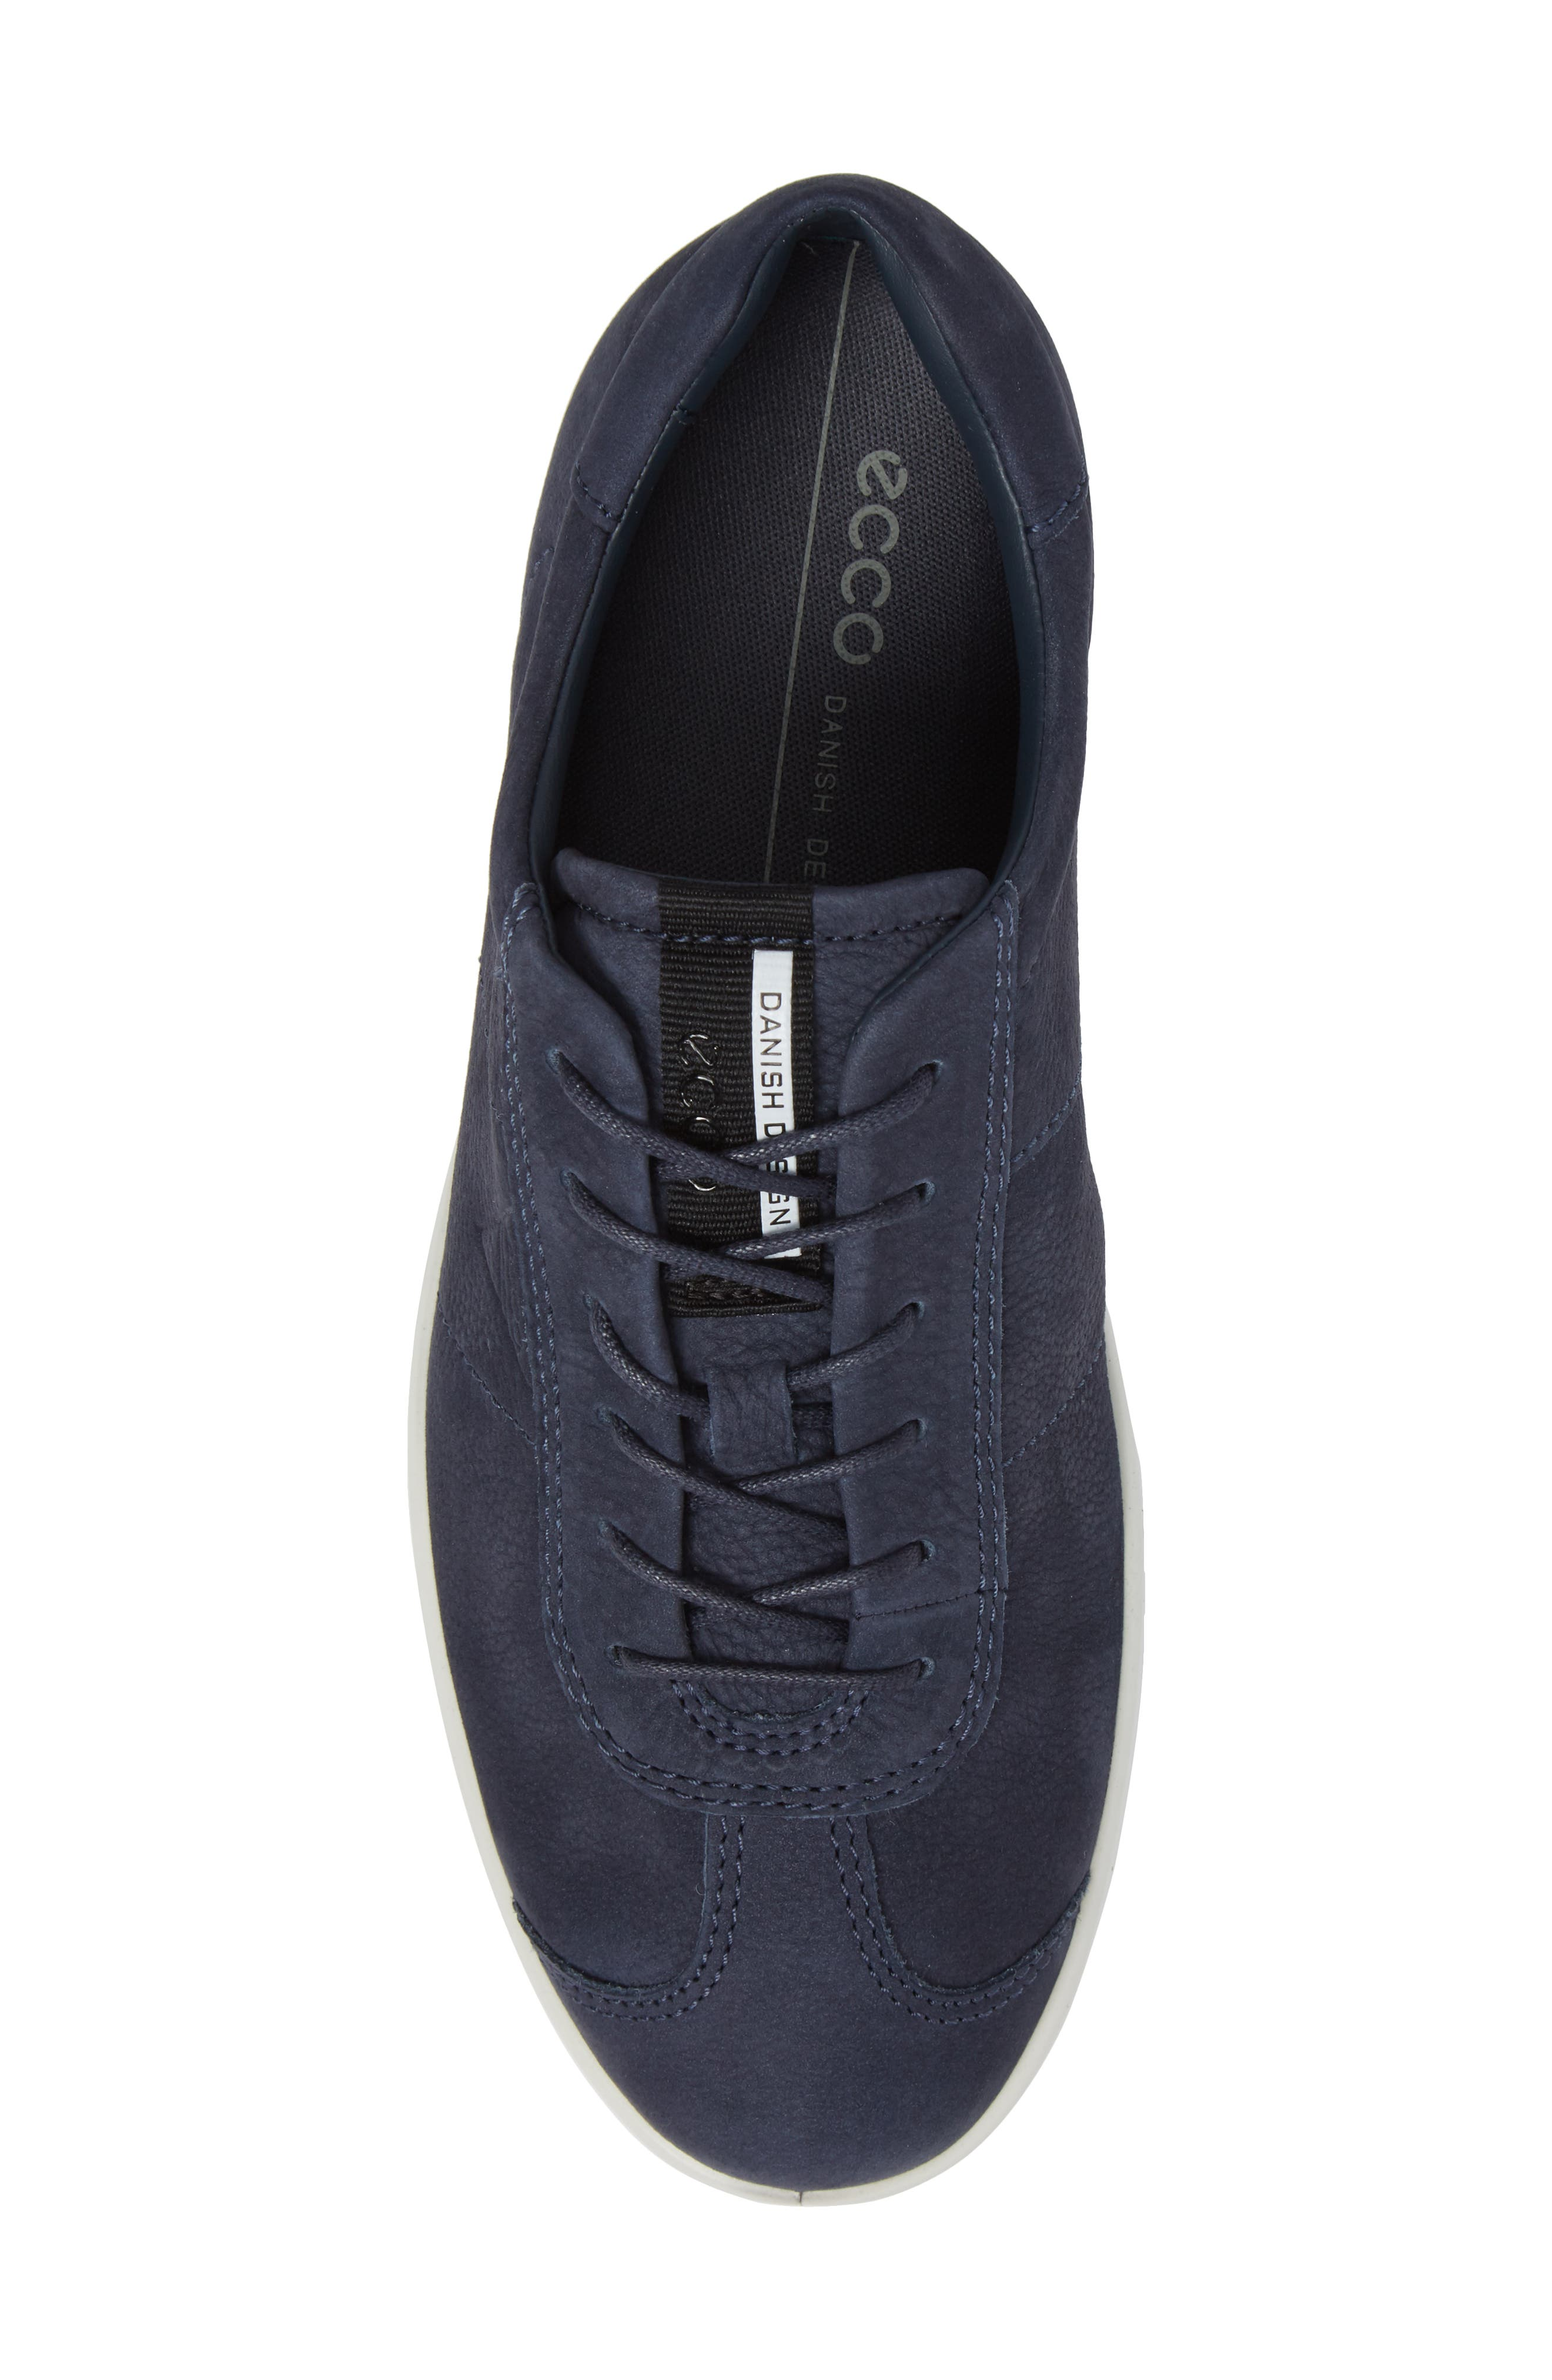 Soft 1 Sneaker,                             Alternate thumbnail 5, color,                             Marine Nubuck